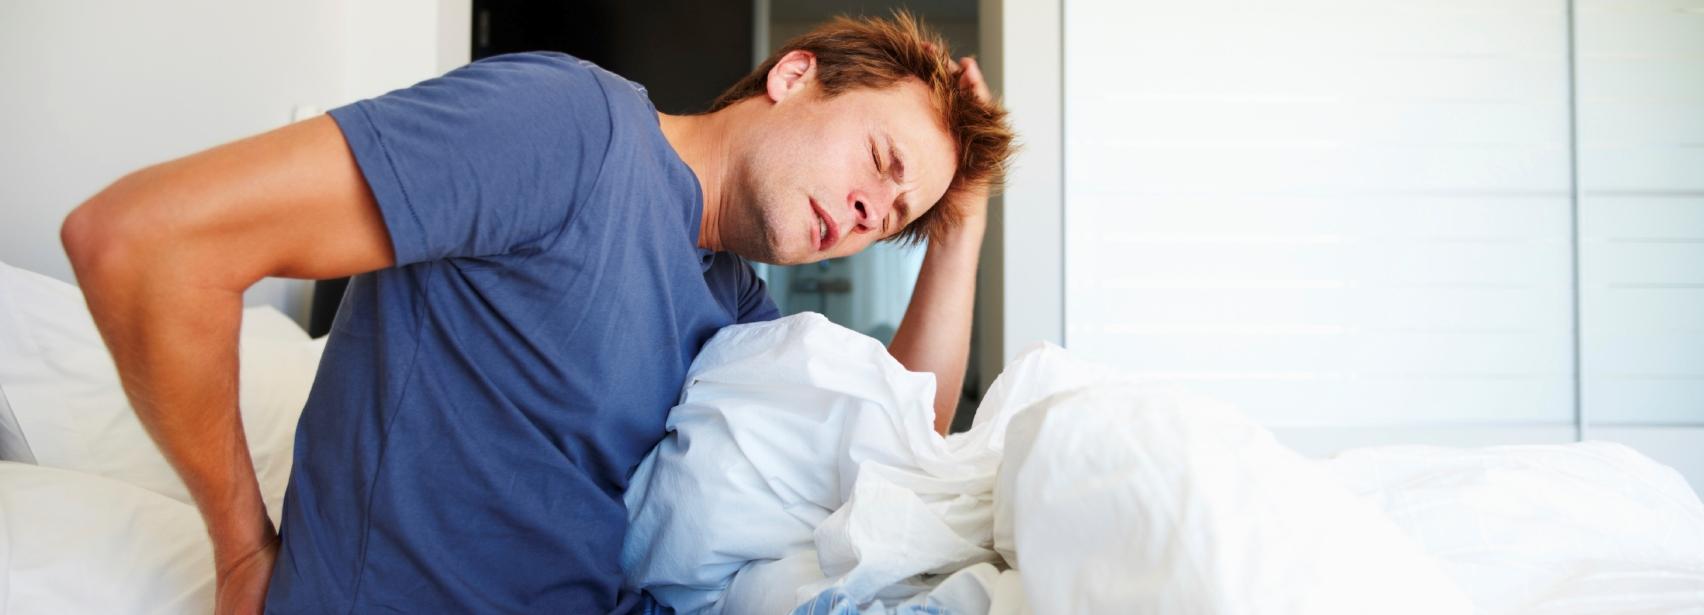 Back pain after sleep